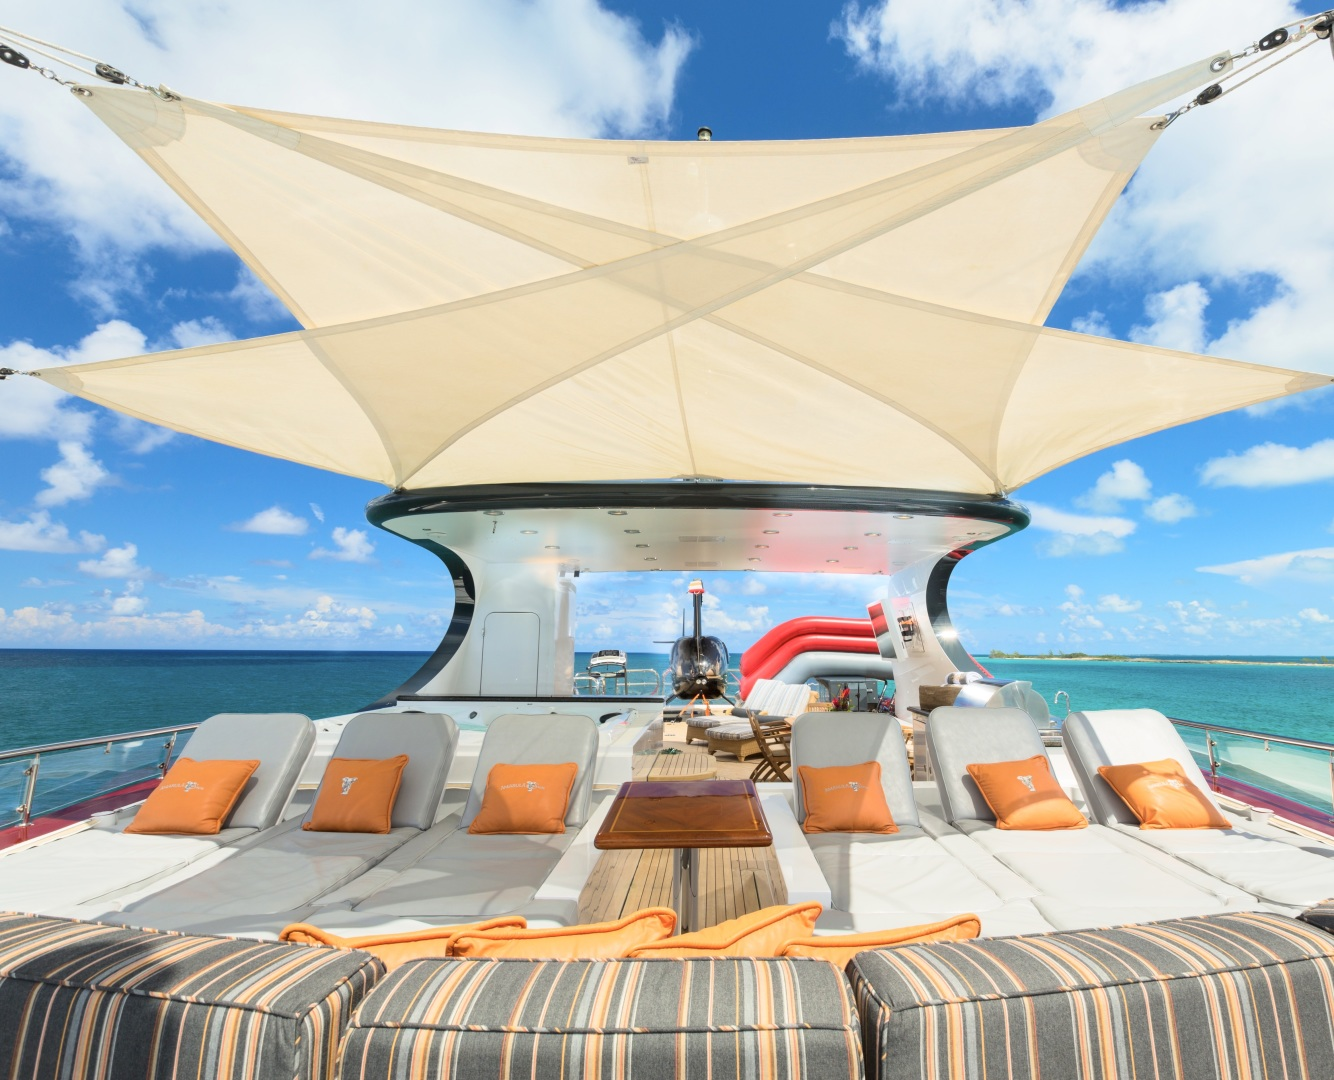 Trinity Yachts-164 Tri-deck Motor Yacht 2008-Amarula Sun Fort Lauderdale-Florida-United States-Sun Deck-1513960 | Thumbnail